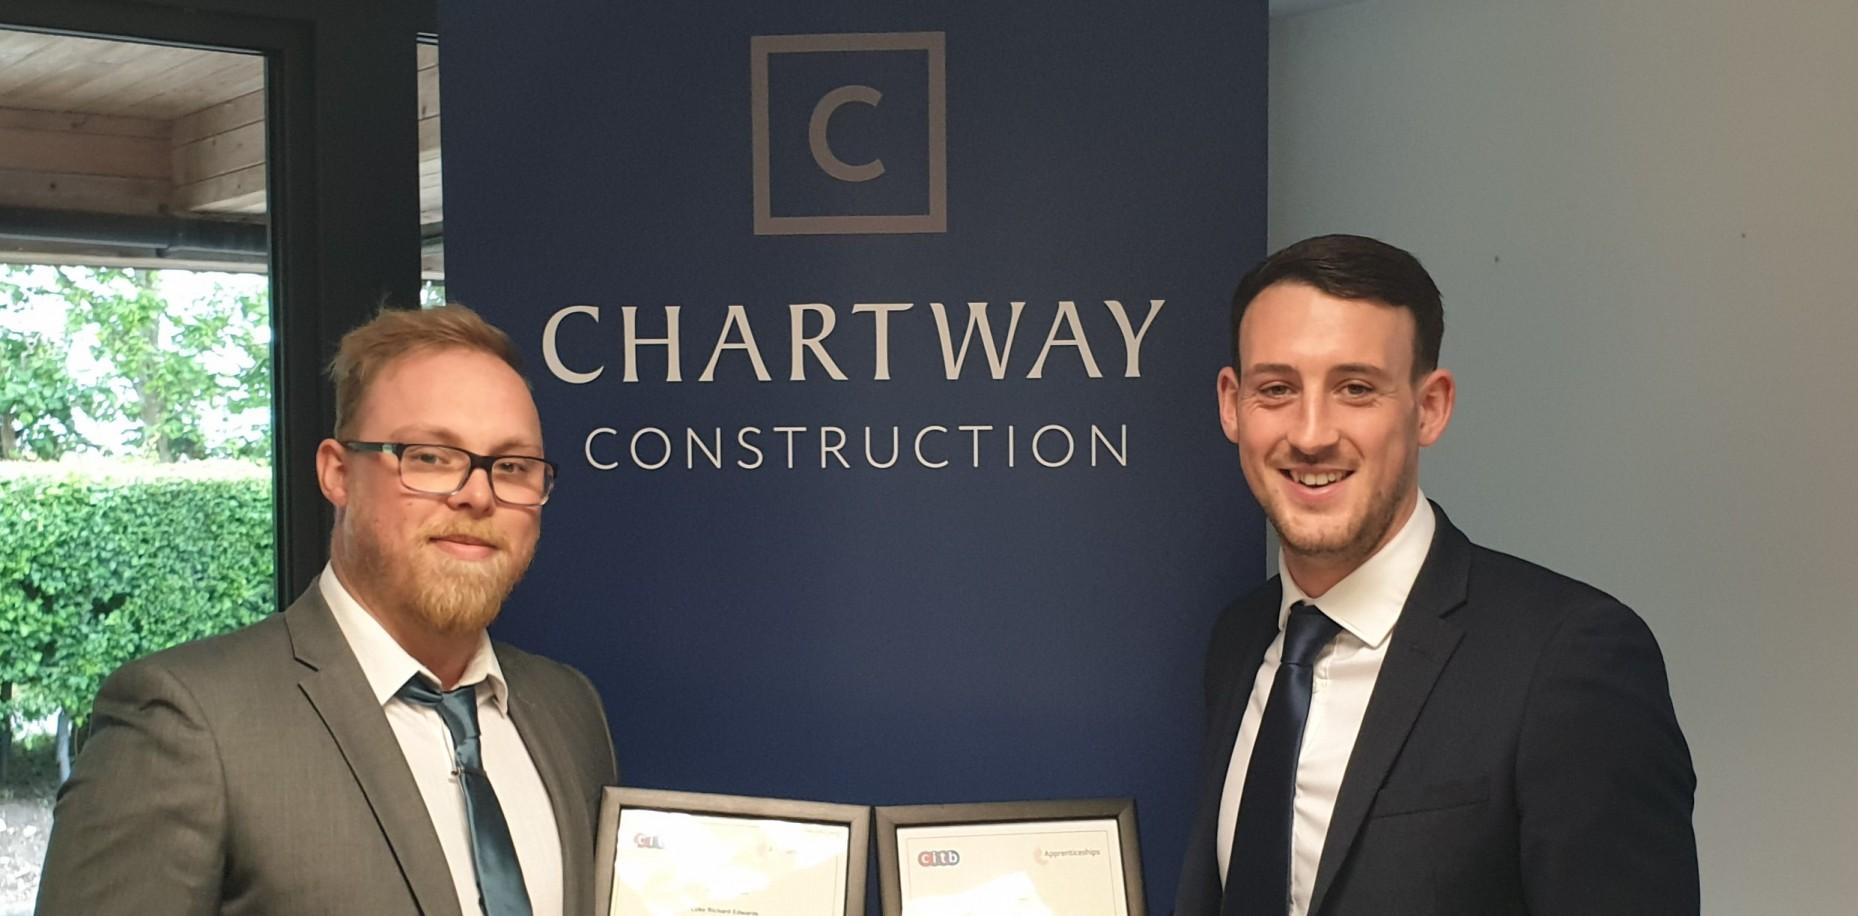 Chartway Apprentices Success